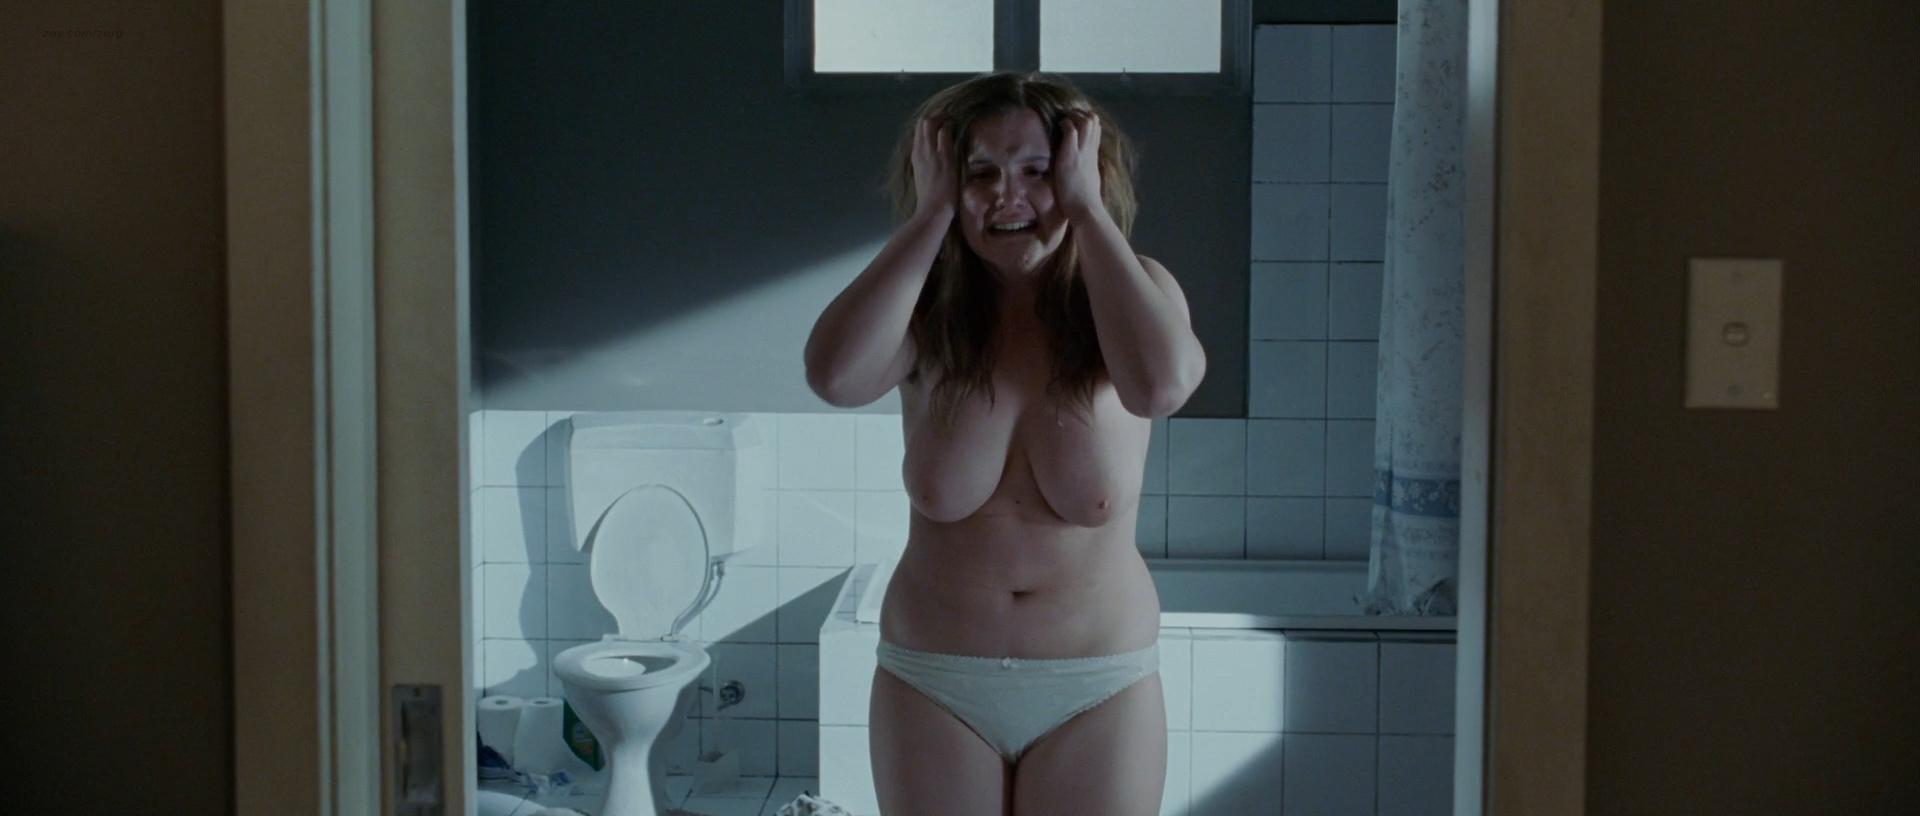 Kelly Kapowski Nude Pics